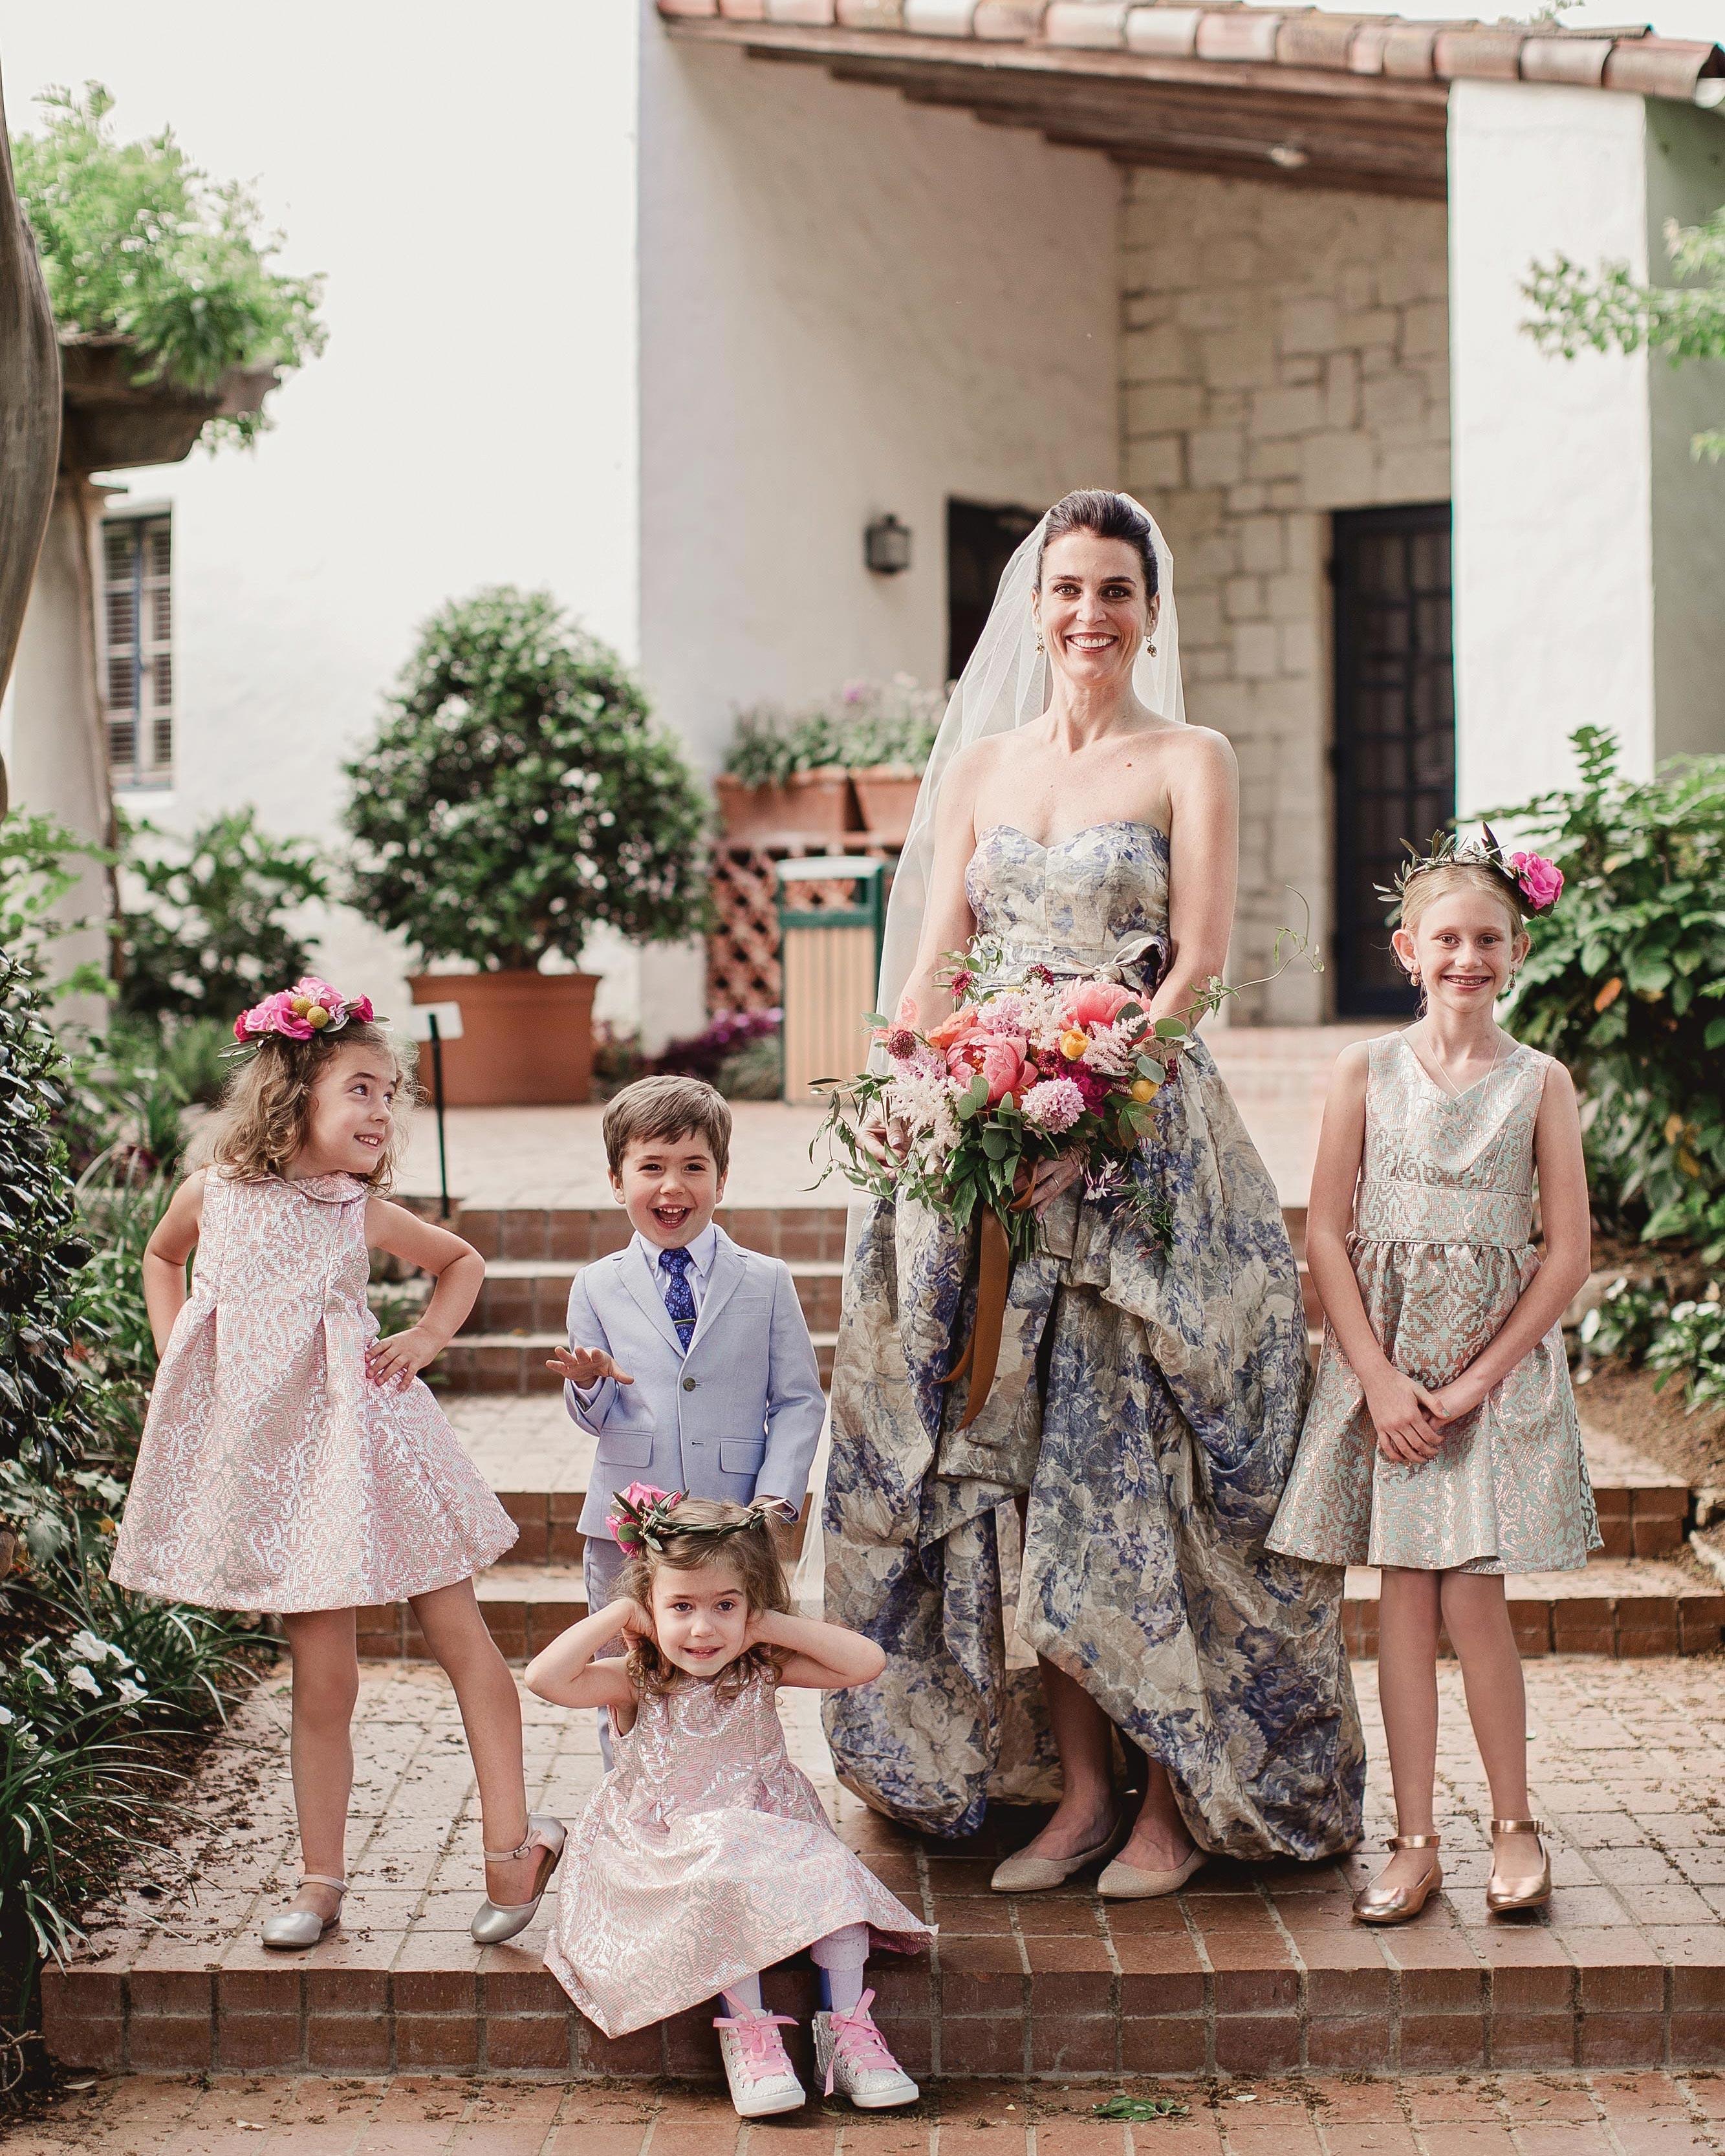 tara-dan-wedding-texas-kids-055-s112848.jpg